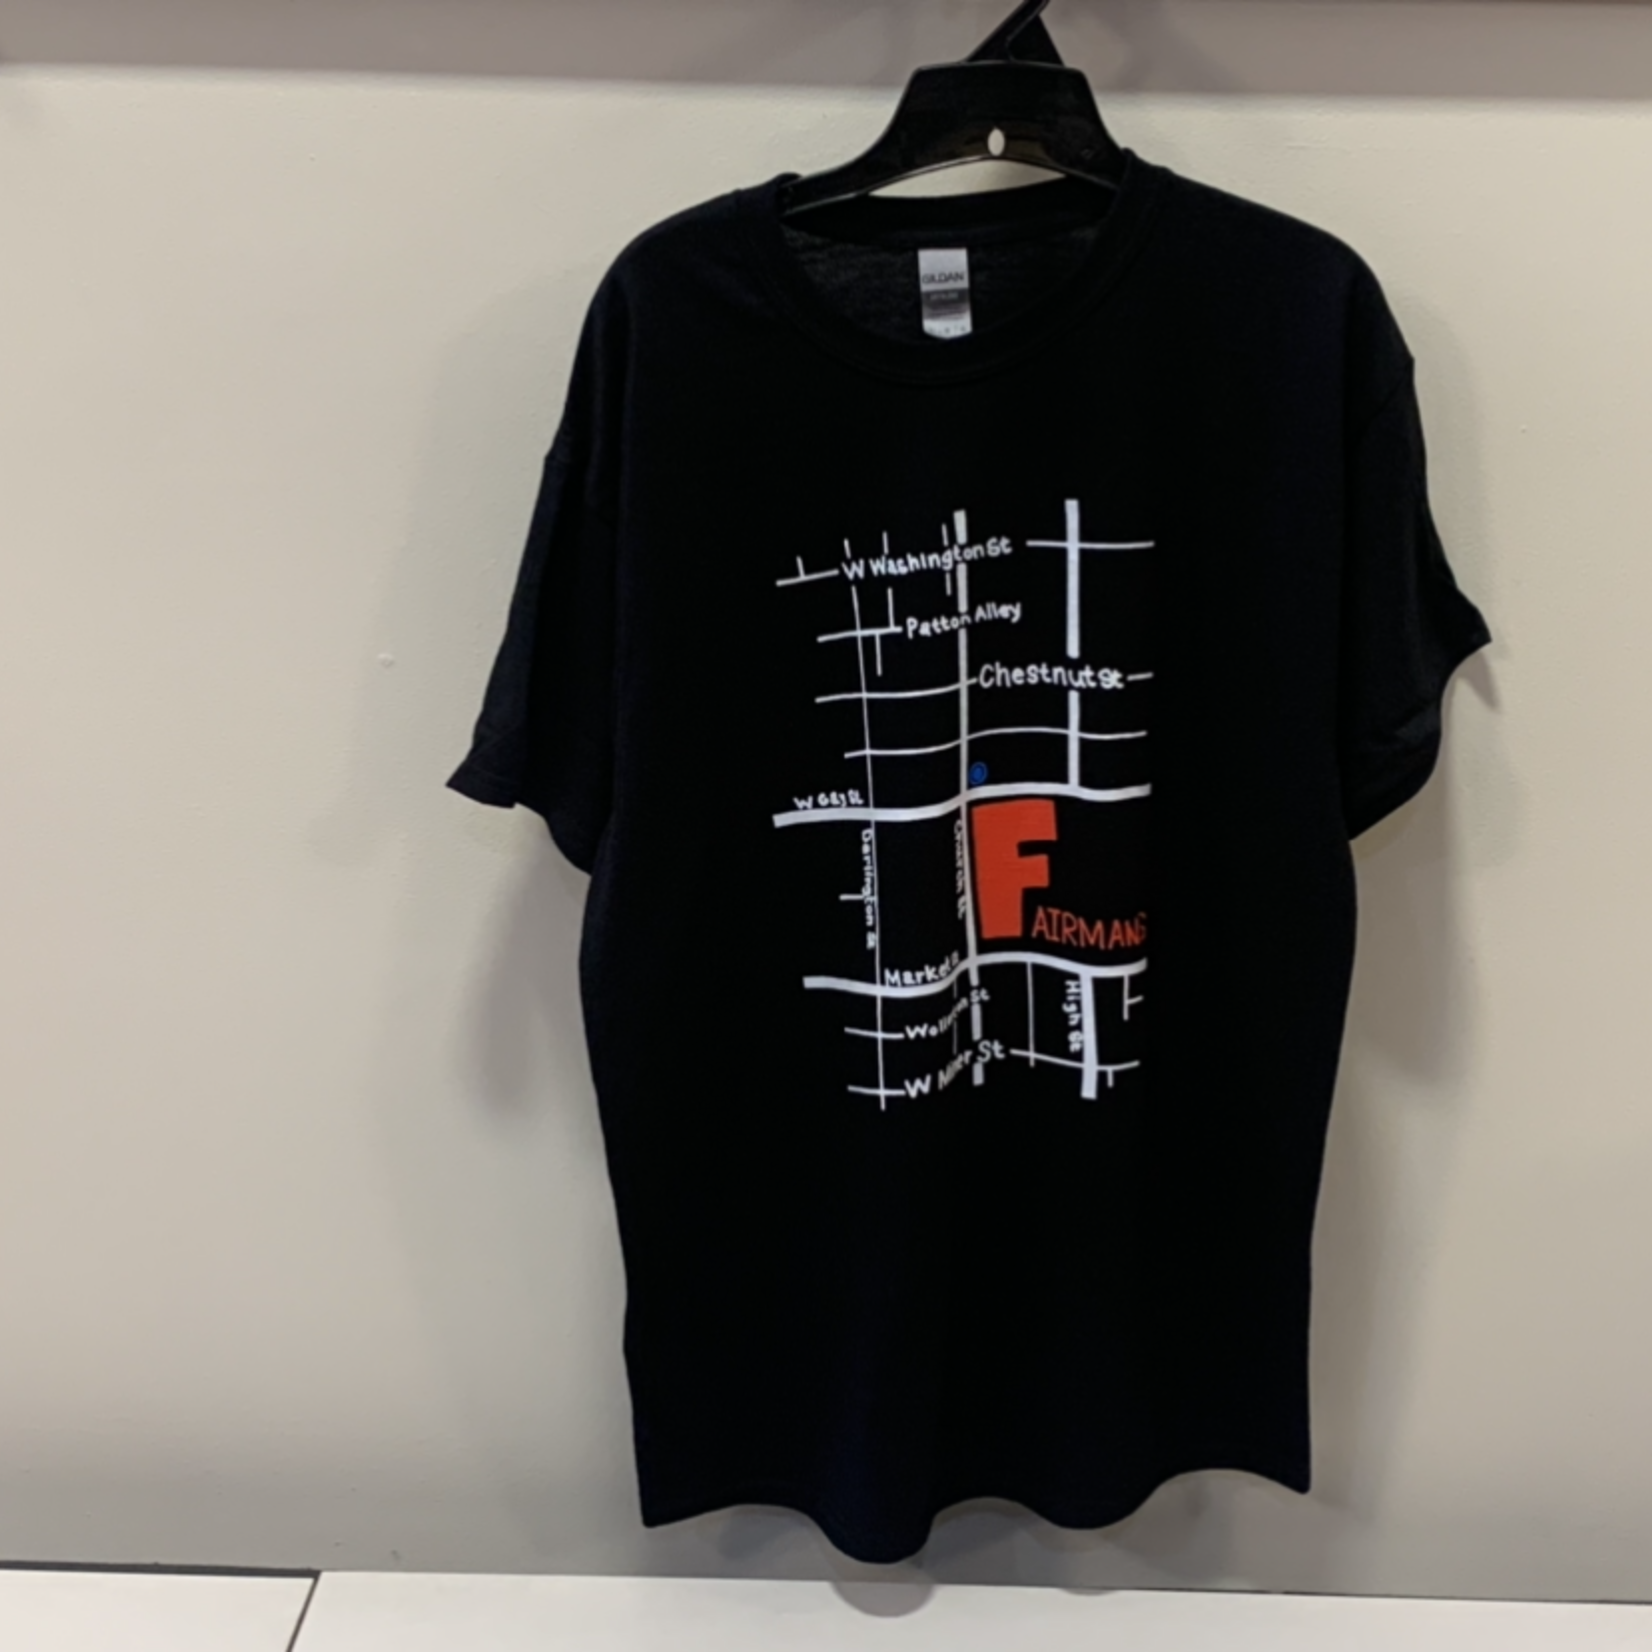 Fairman's Fairman's Map T-Shirt